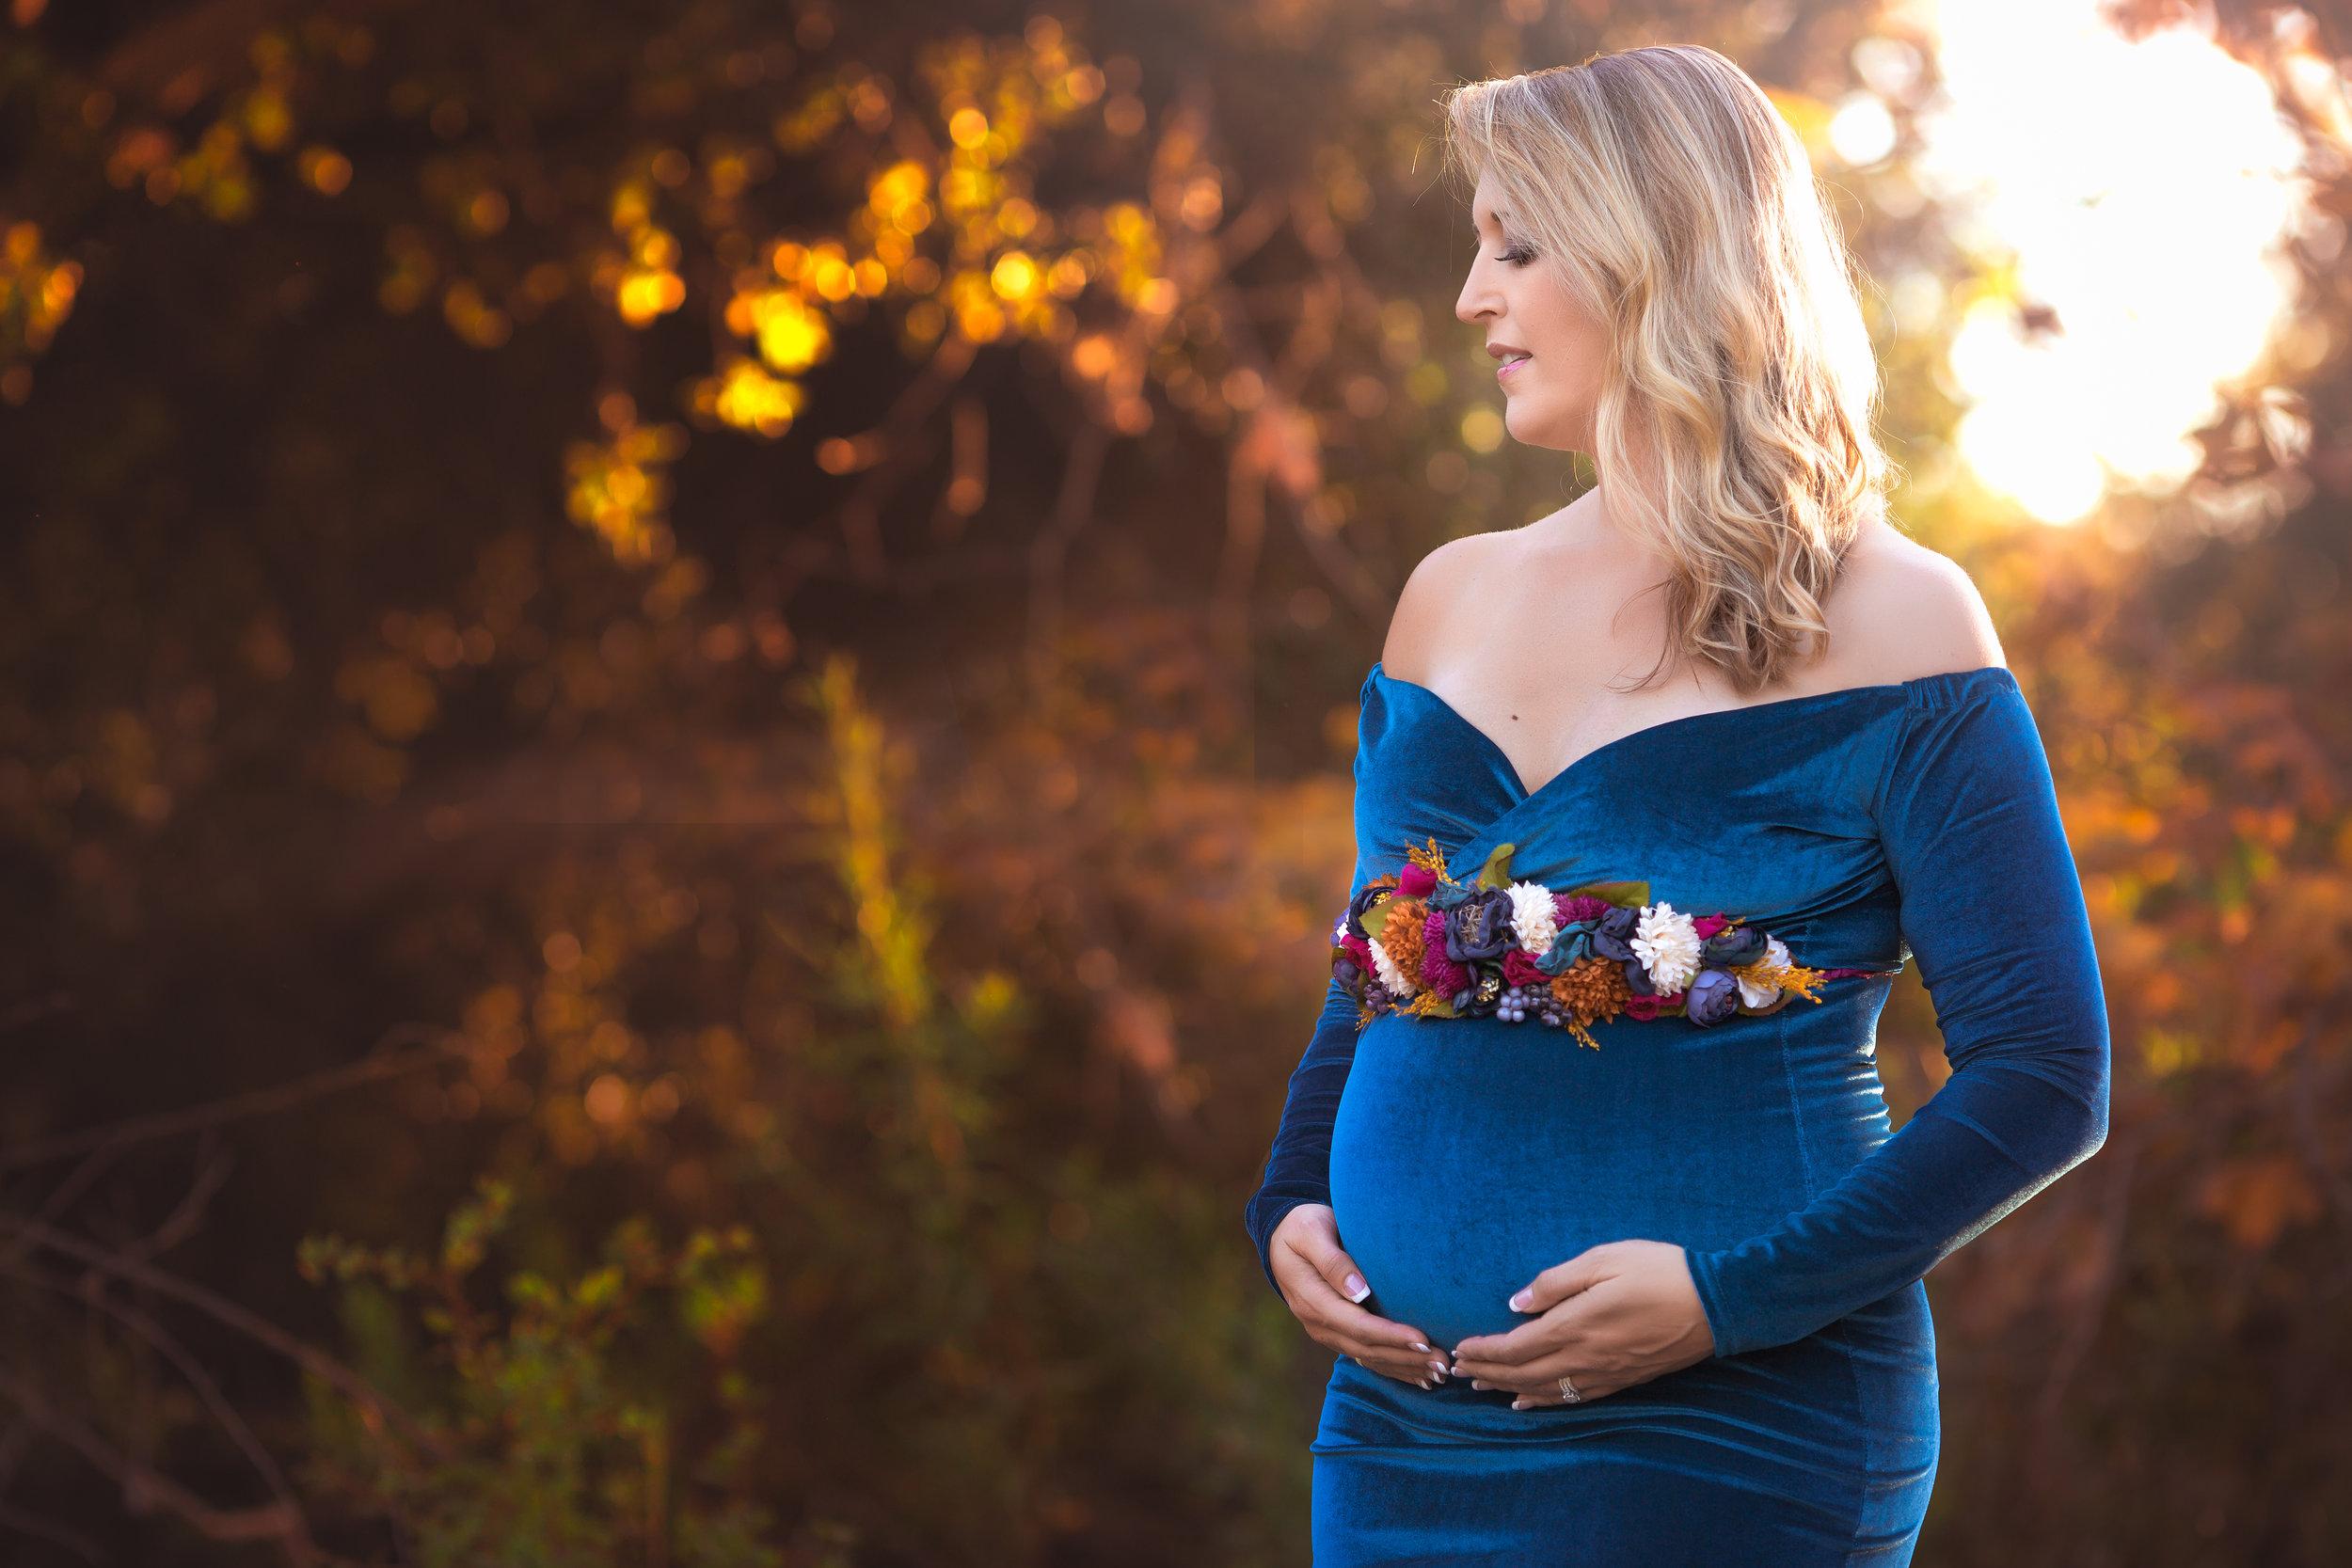 Donna-MaternityModel-OhMyGoddardPhotography-3.jpg